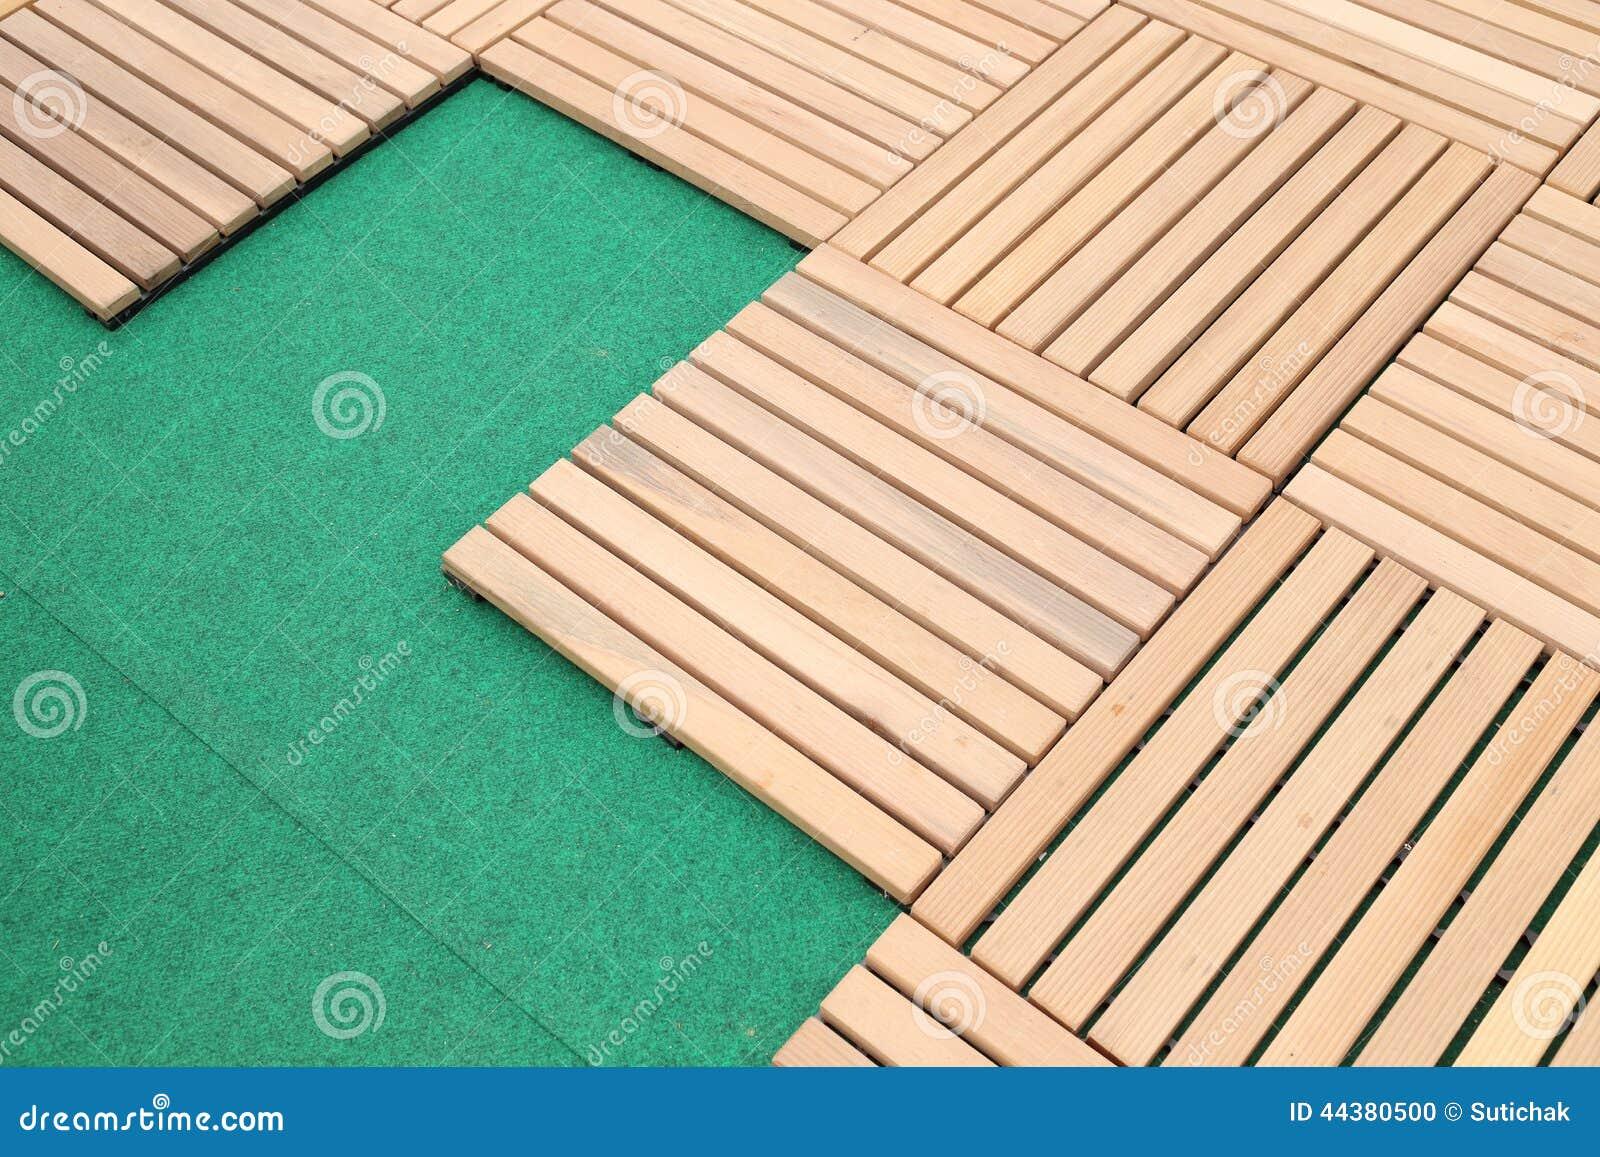 Wood deck panel floor background stock photo image 44380500 for Wood floor panels